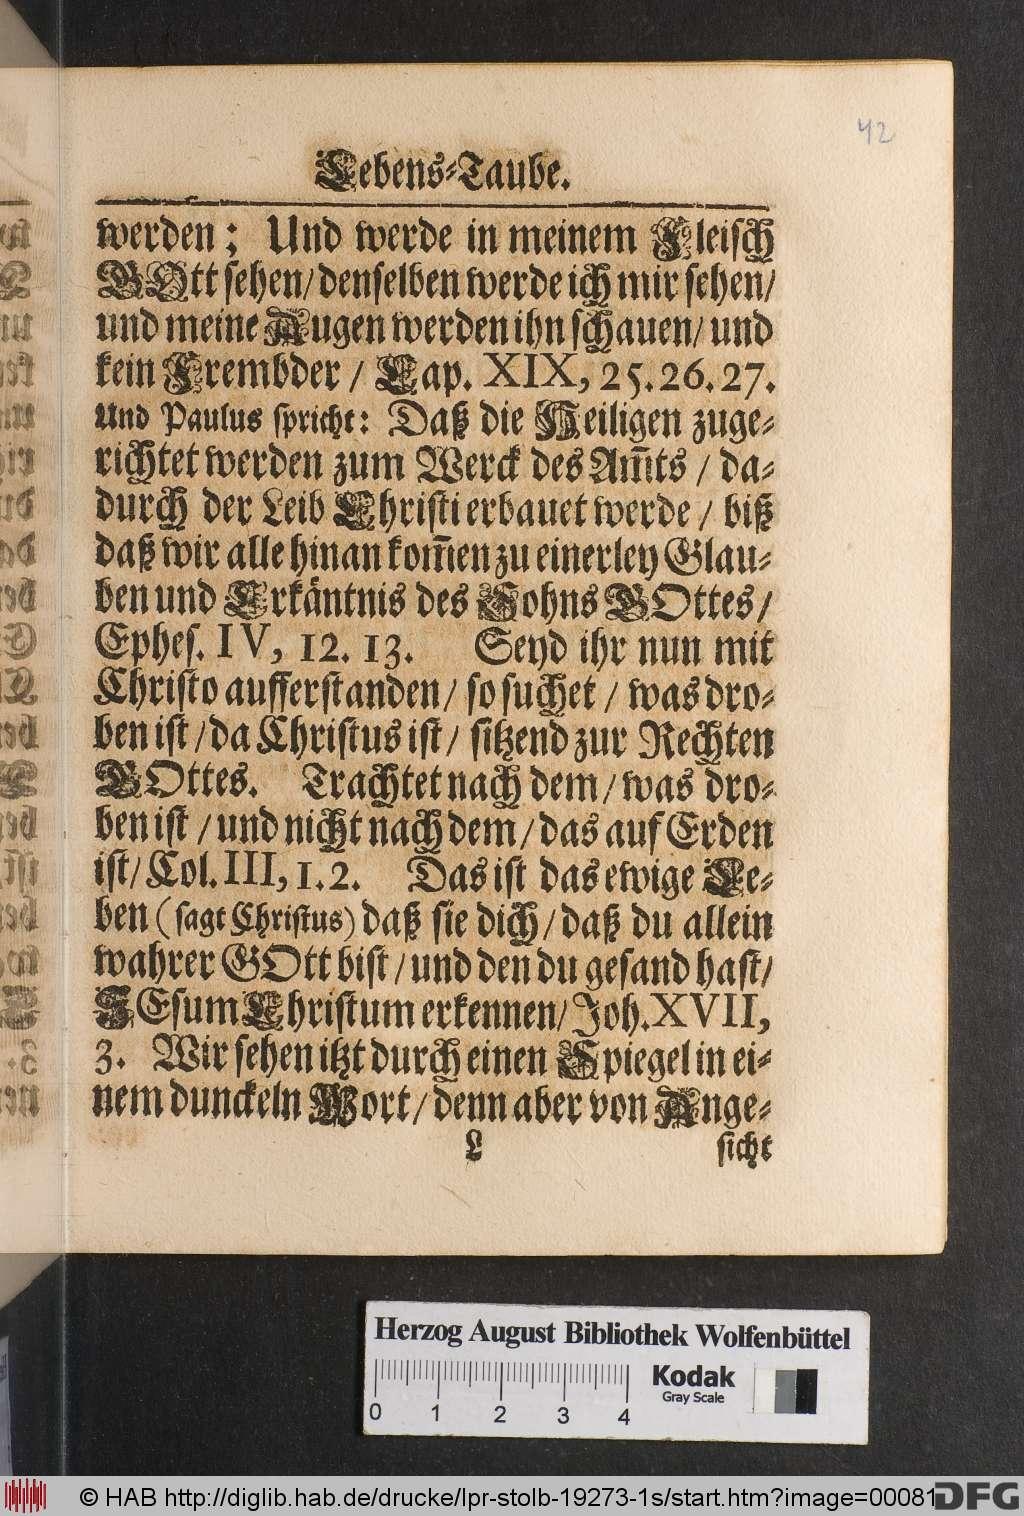 http://diglib.hab.de/drucke/lpr-stolb-19273-1s/00081.jpg